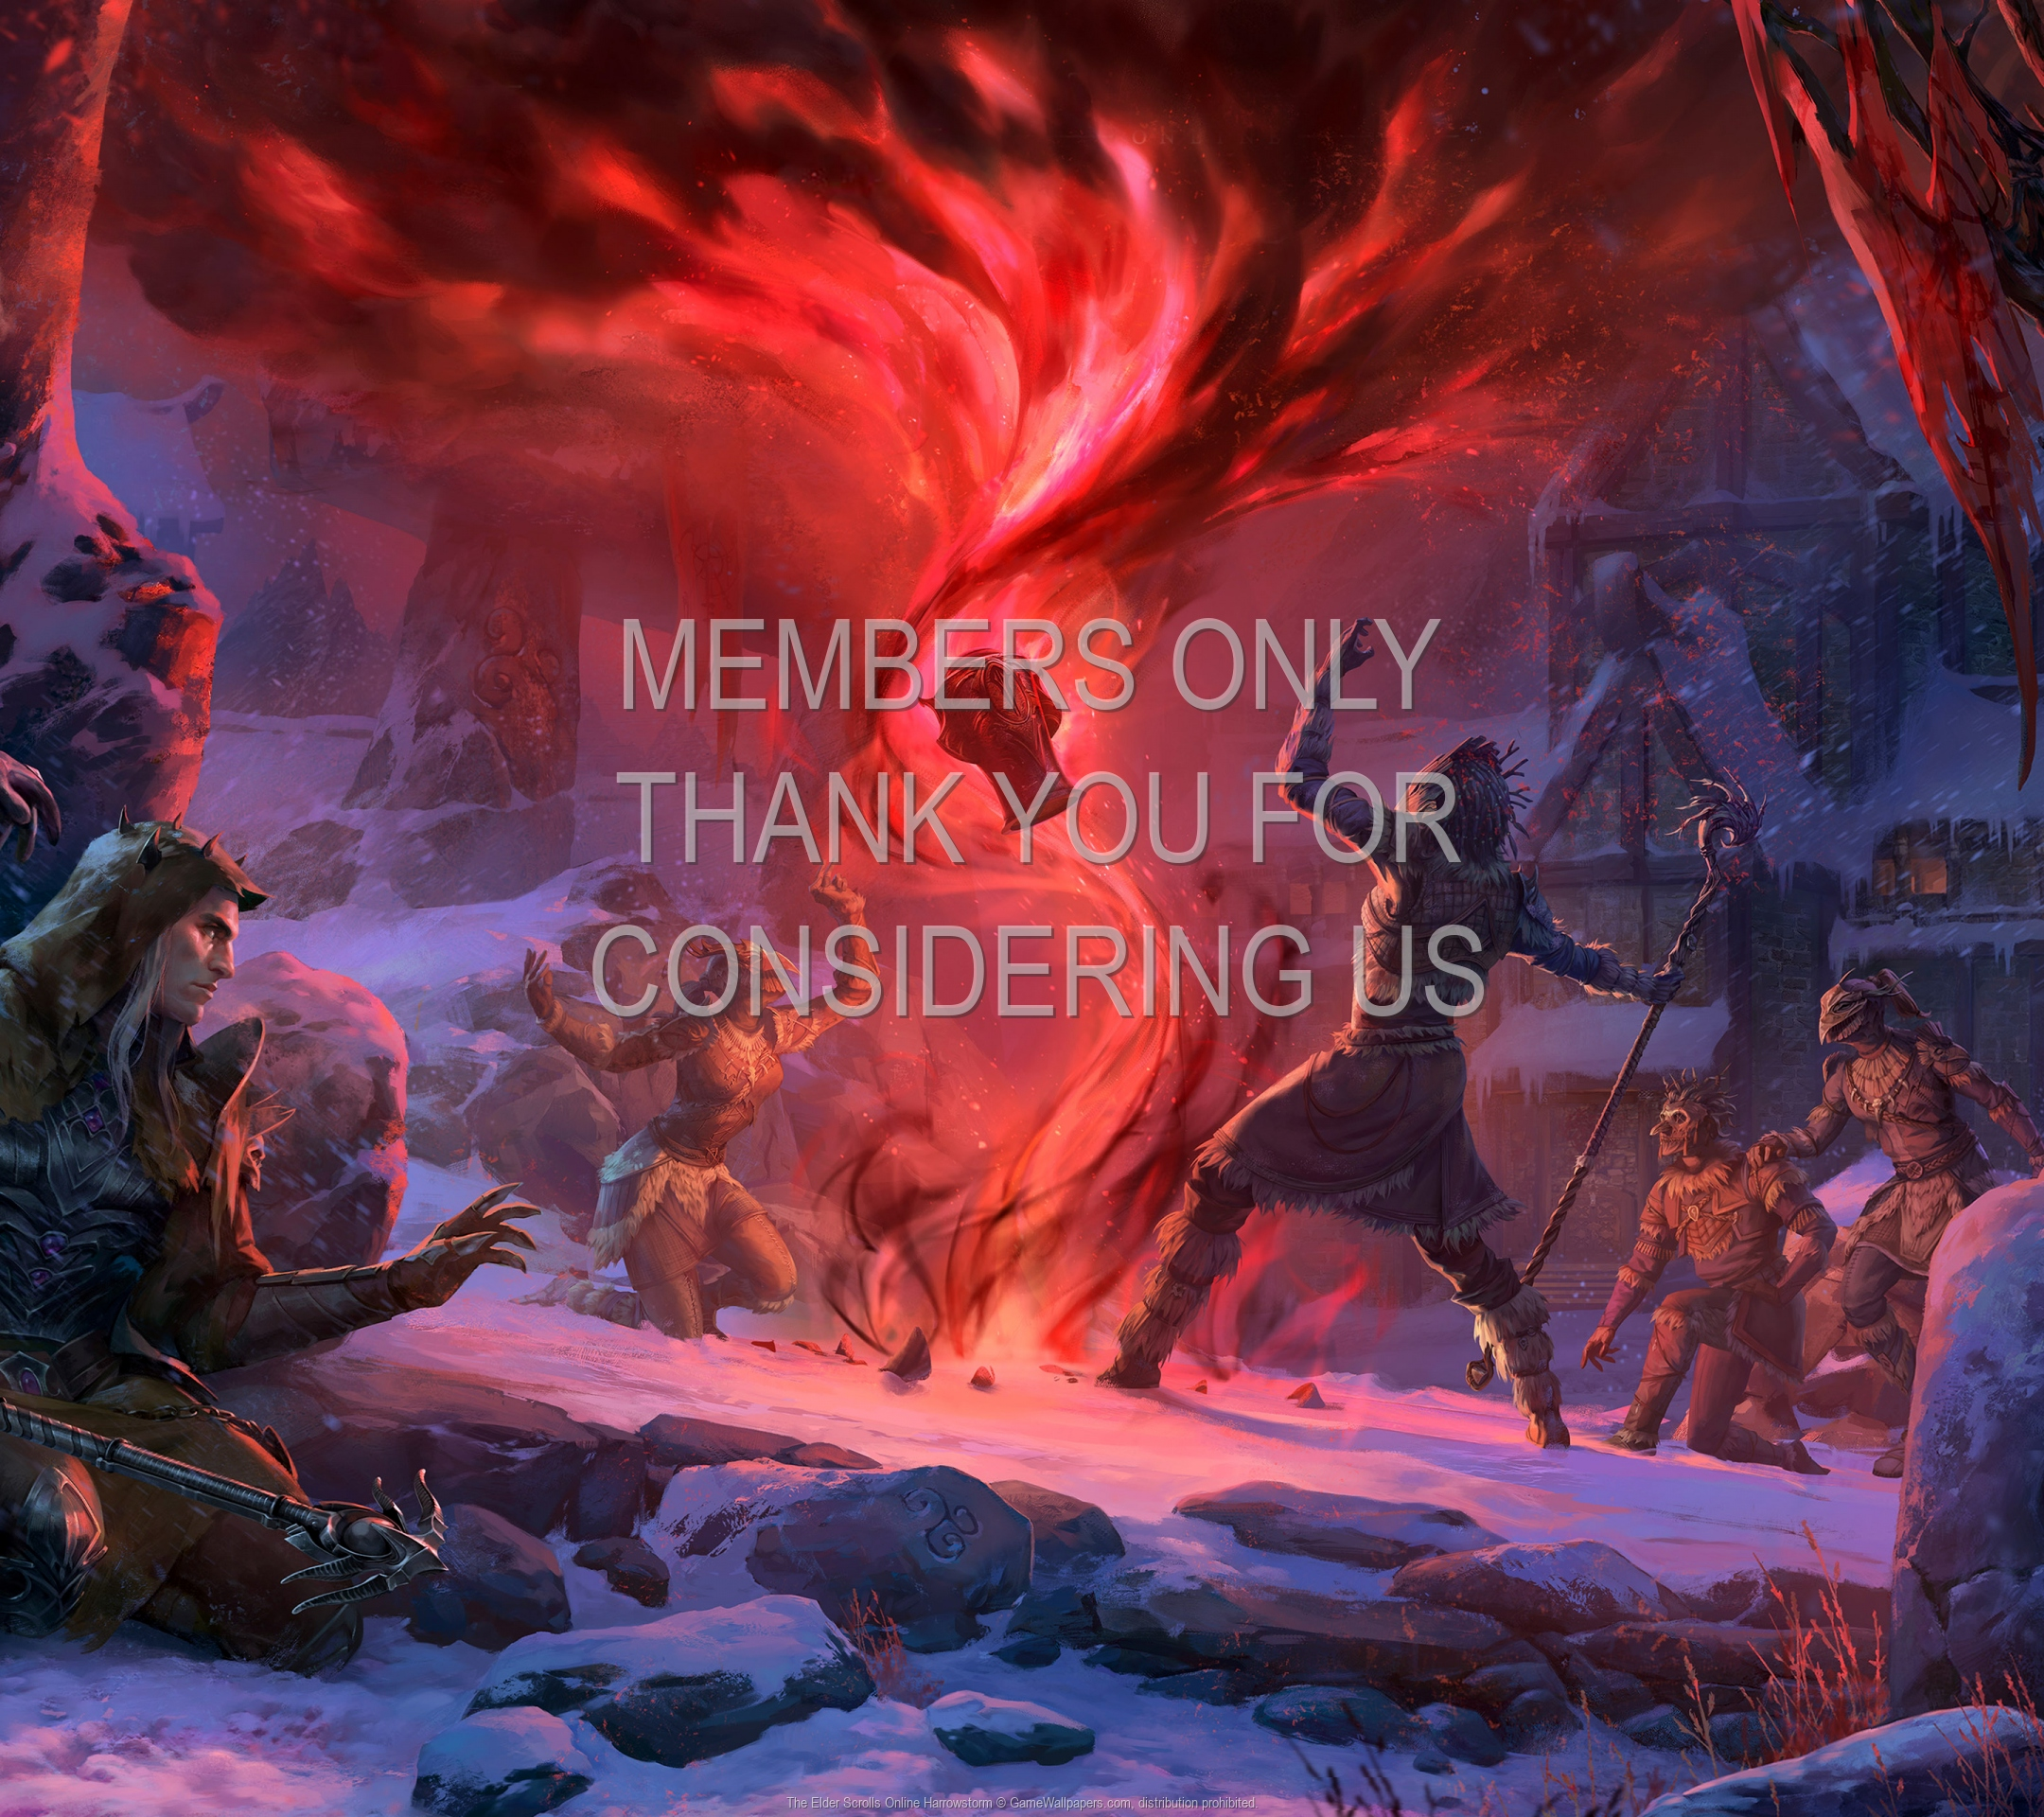 The Elder Scrolls Online: Harrowstorm 1920x1080 Mobile wallpaper or background 01